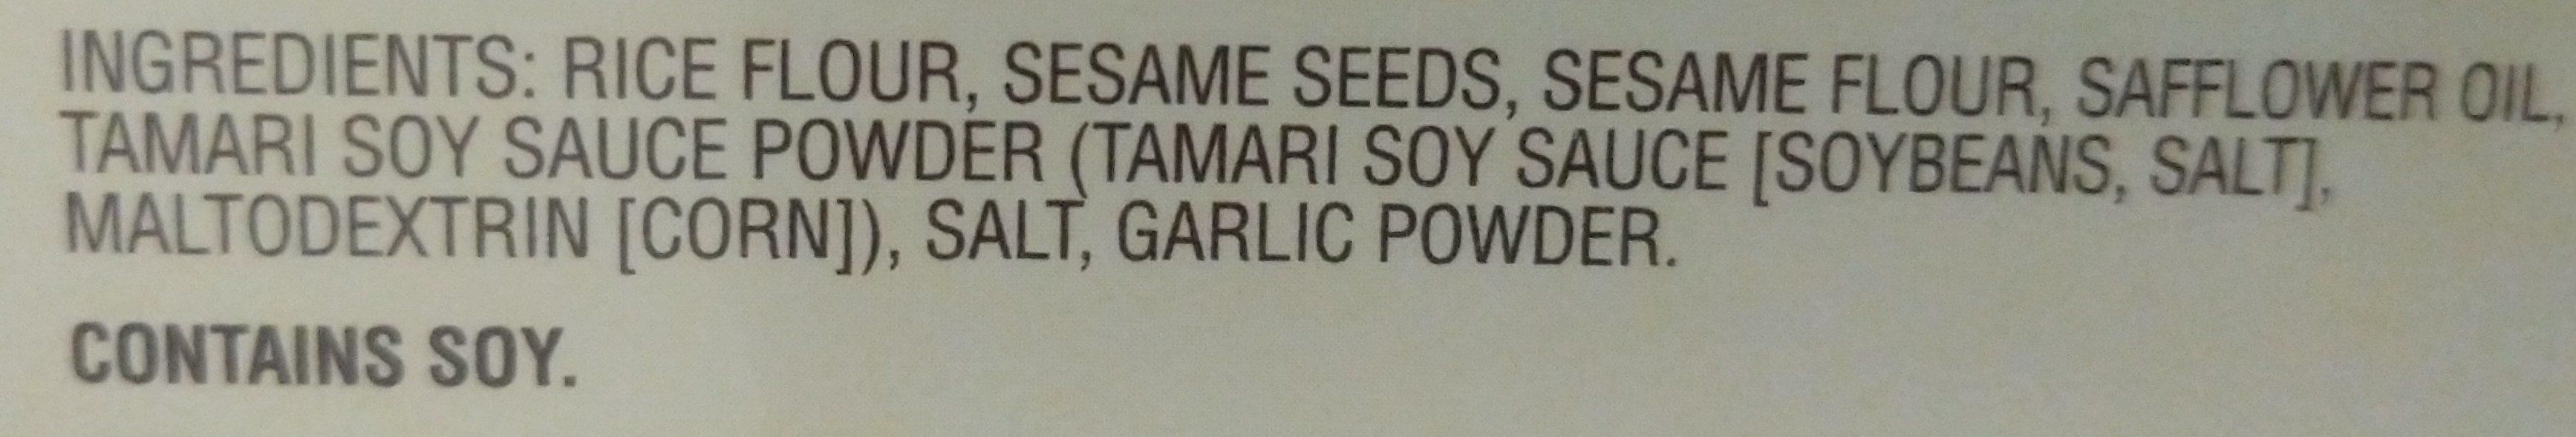 Savory Thin Crackers, Original - Ingredients